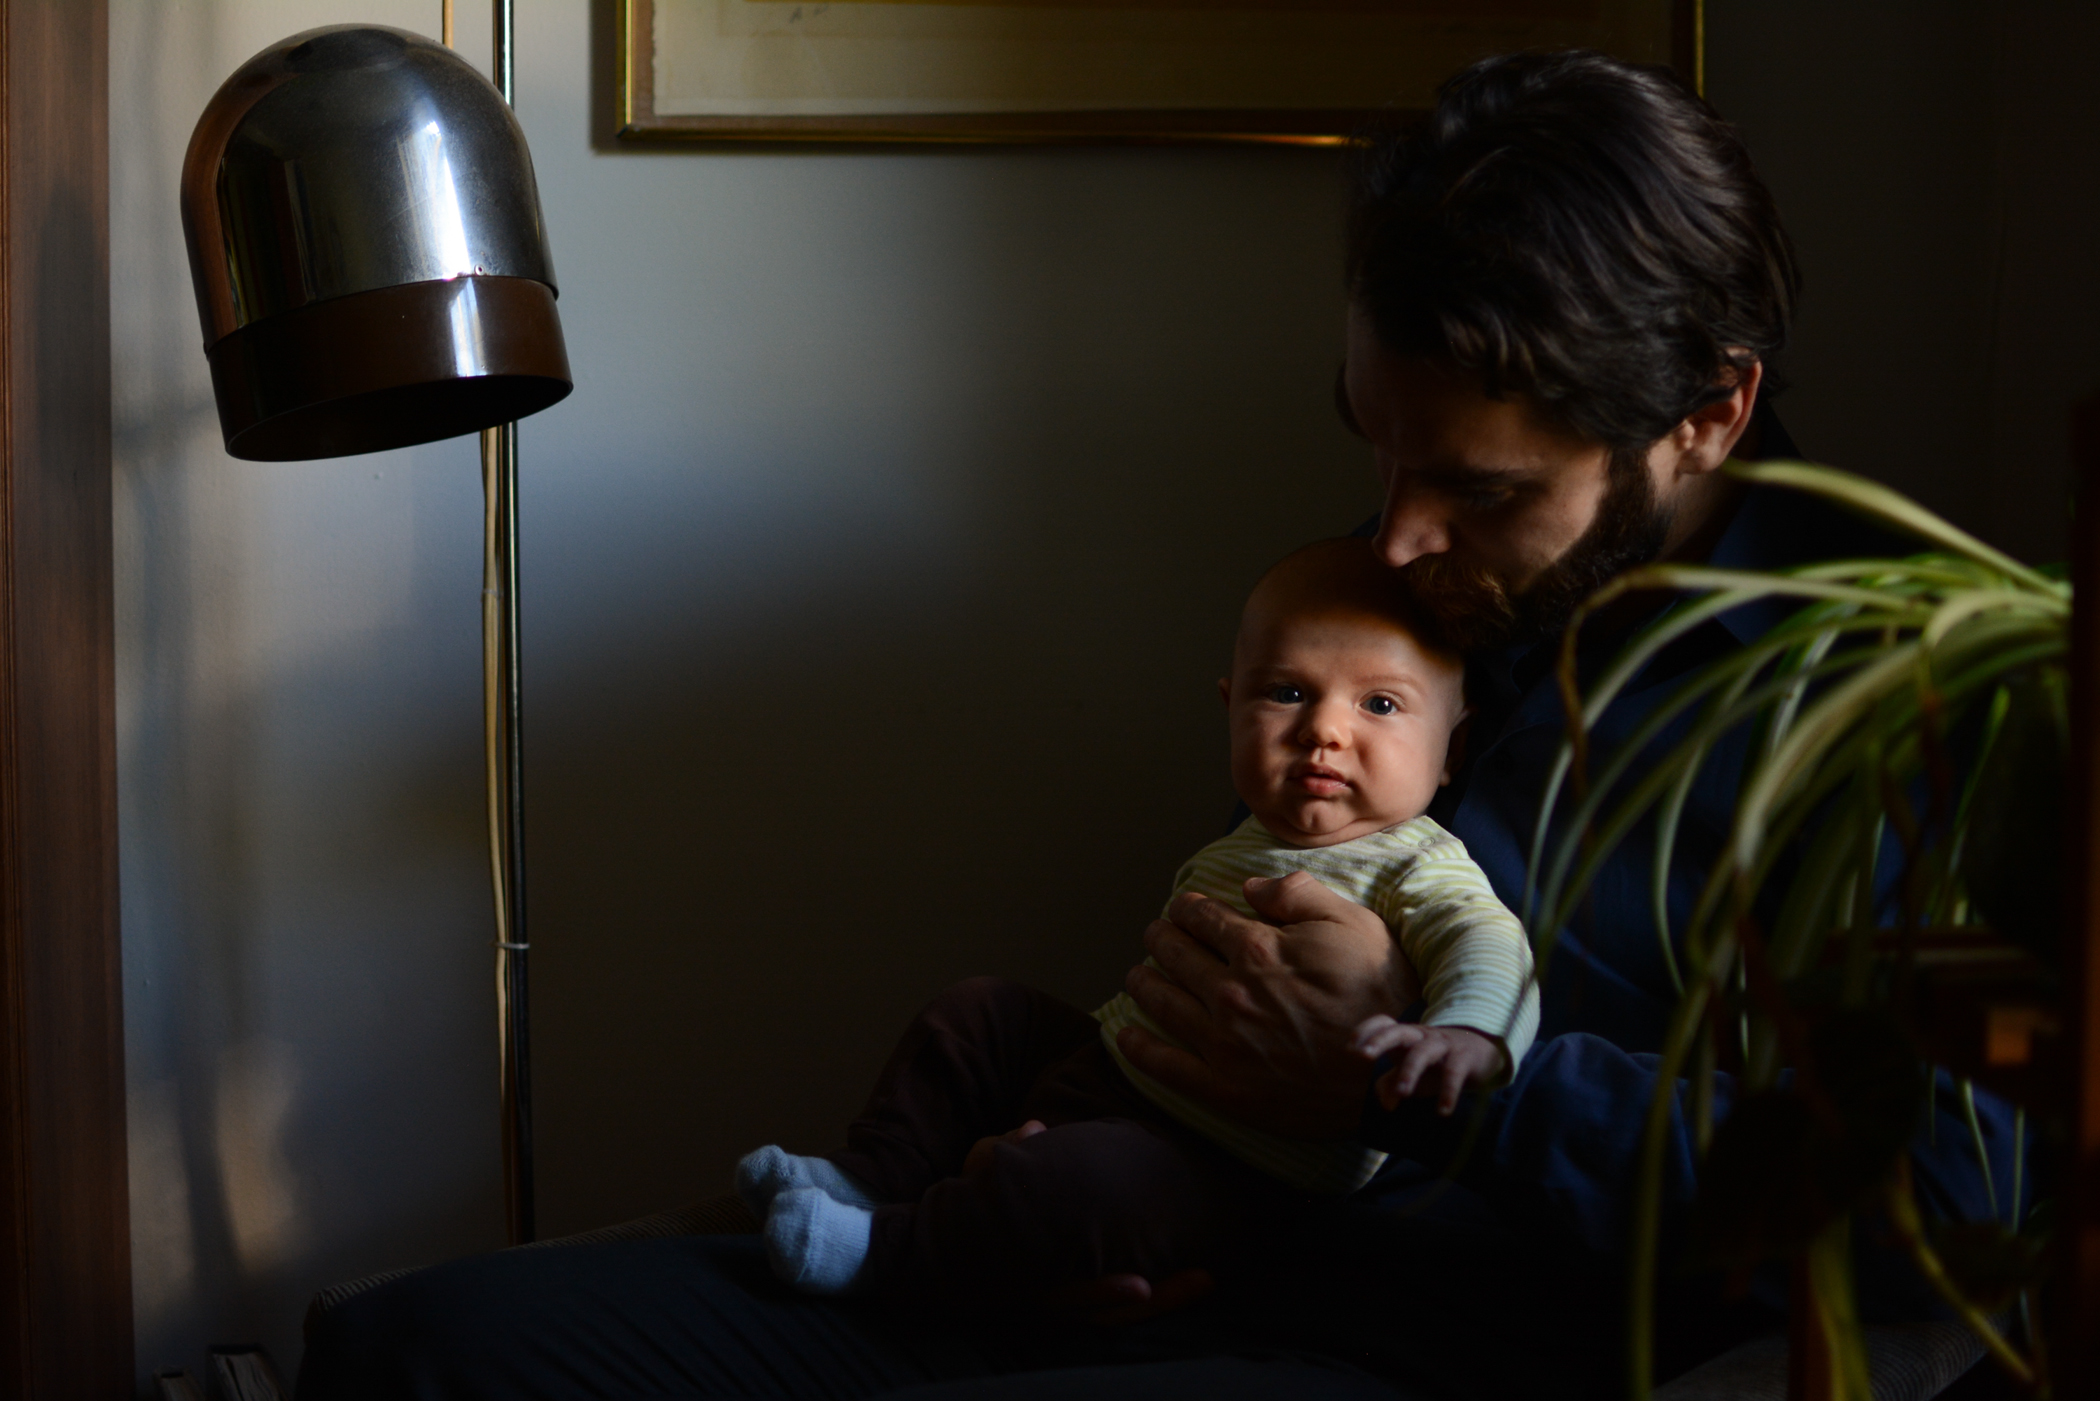 Bebe_toute_annee_Marianne_Charland_photographe_famille_nouveau-ne_enfant_Montreal_Basse-7.jpg